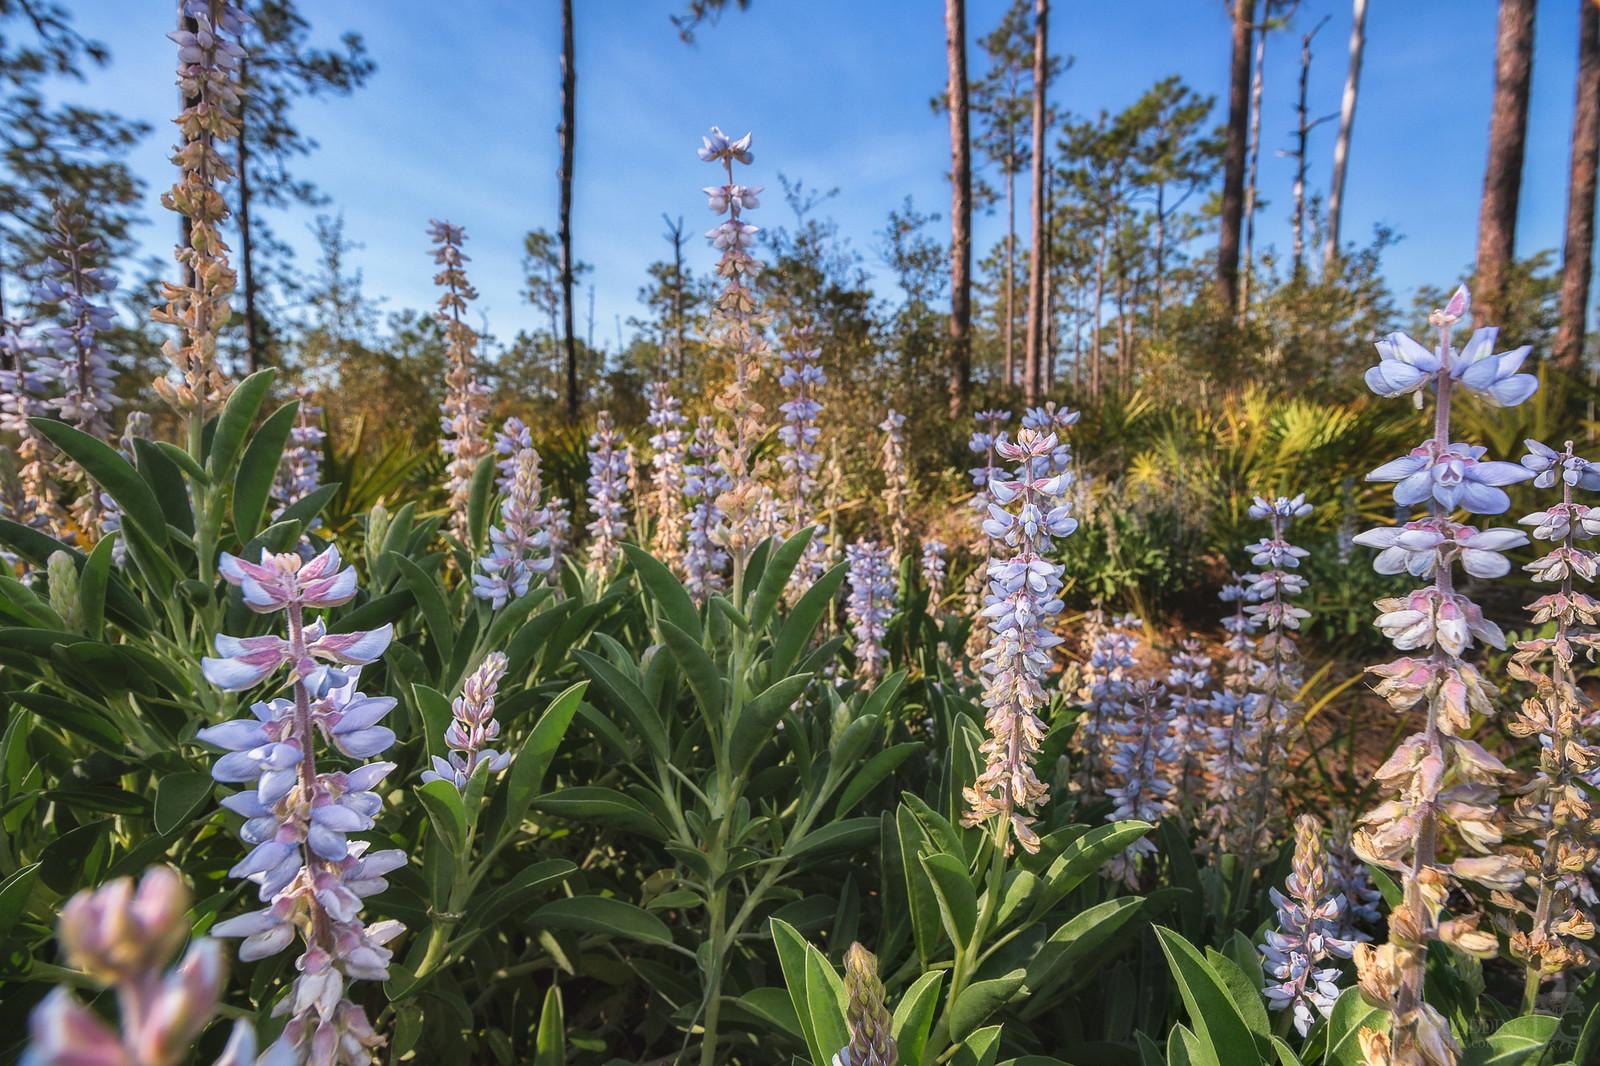 Skyblue lupine (Lupinus diffusus) at Split Oak Forest in Orlando, FL [OC] [1600×1067]